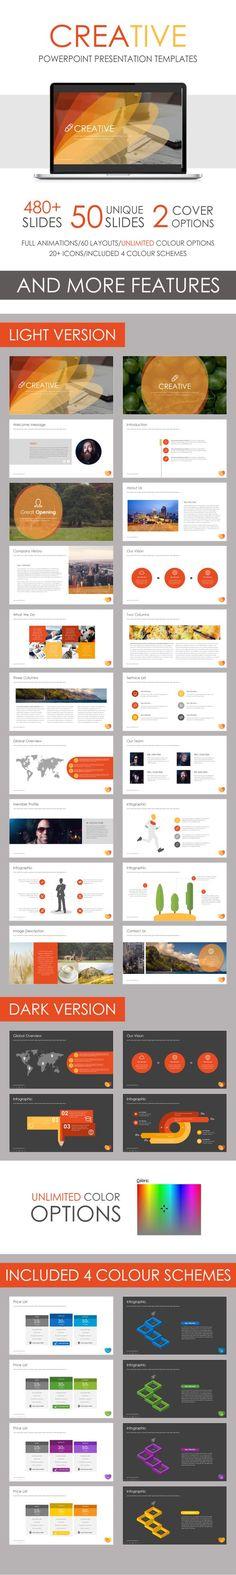 Creative PowerPoint Template. Download here: http://graphicriver.net/item/creative-powerpoint-template/15679412?ref=ksioks